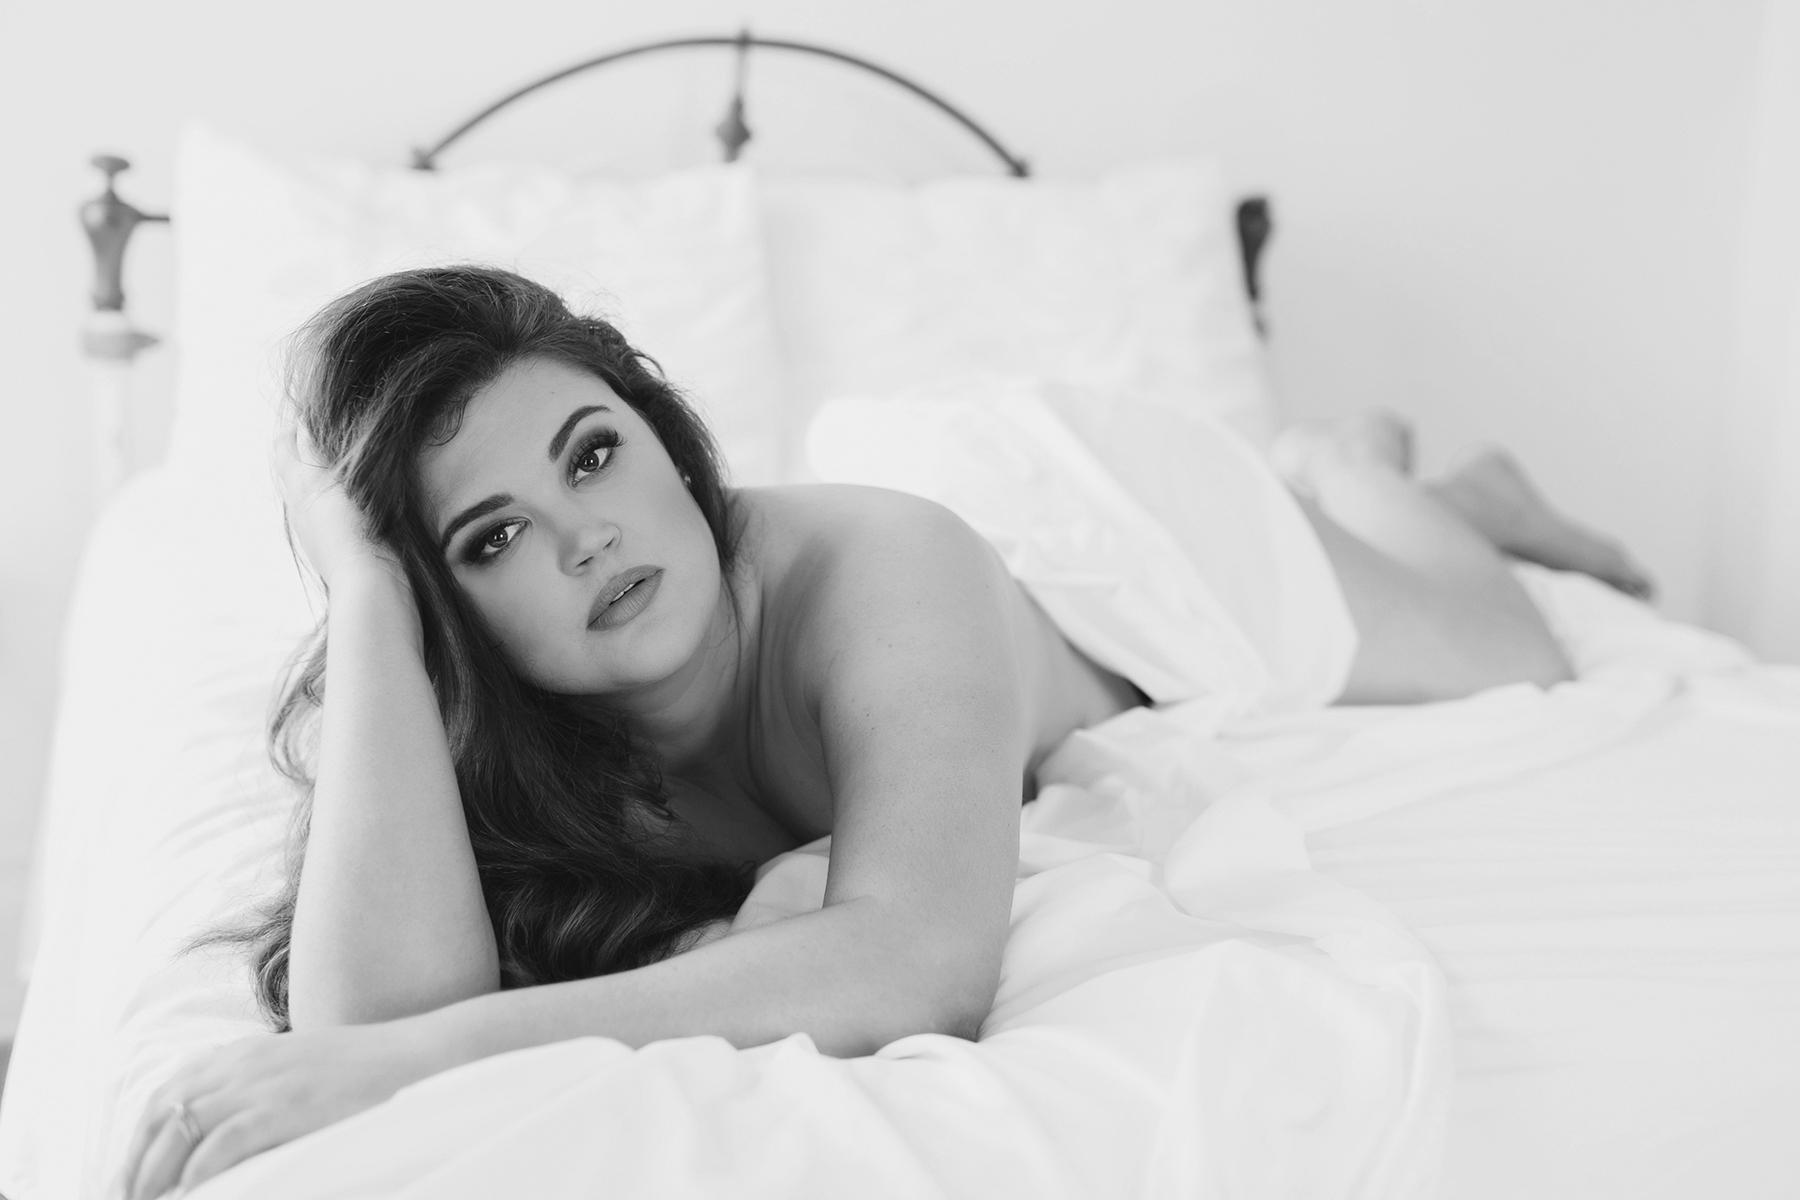 austin-tx-boudoir-photographer-photography-kimberly-brooke-26.jpg